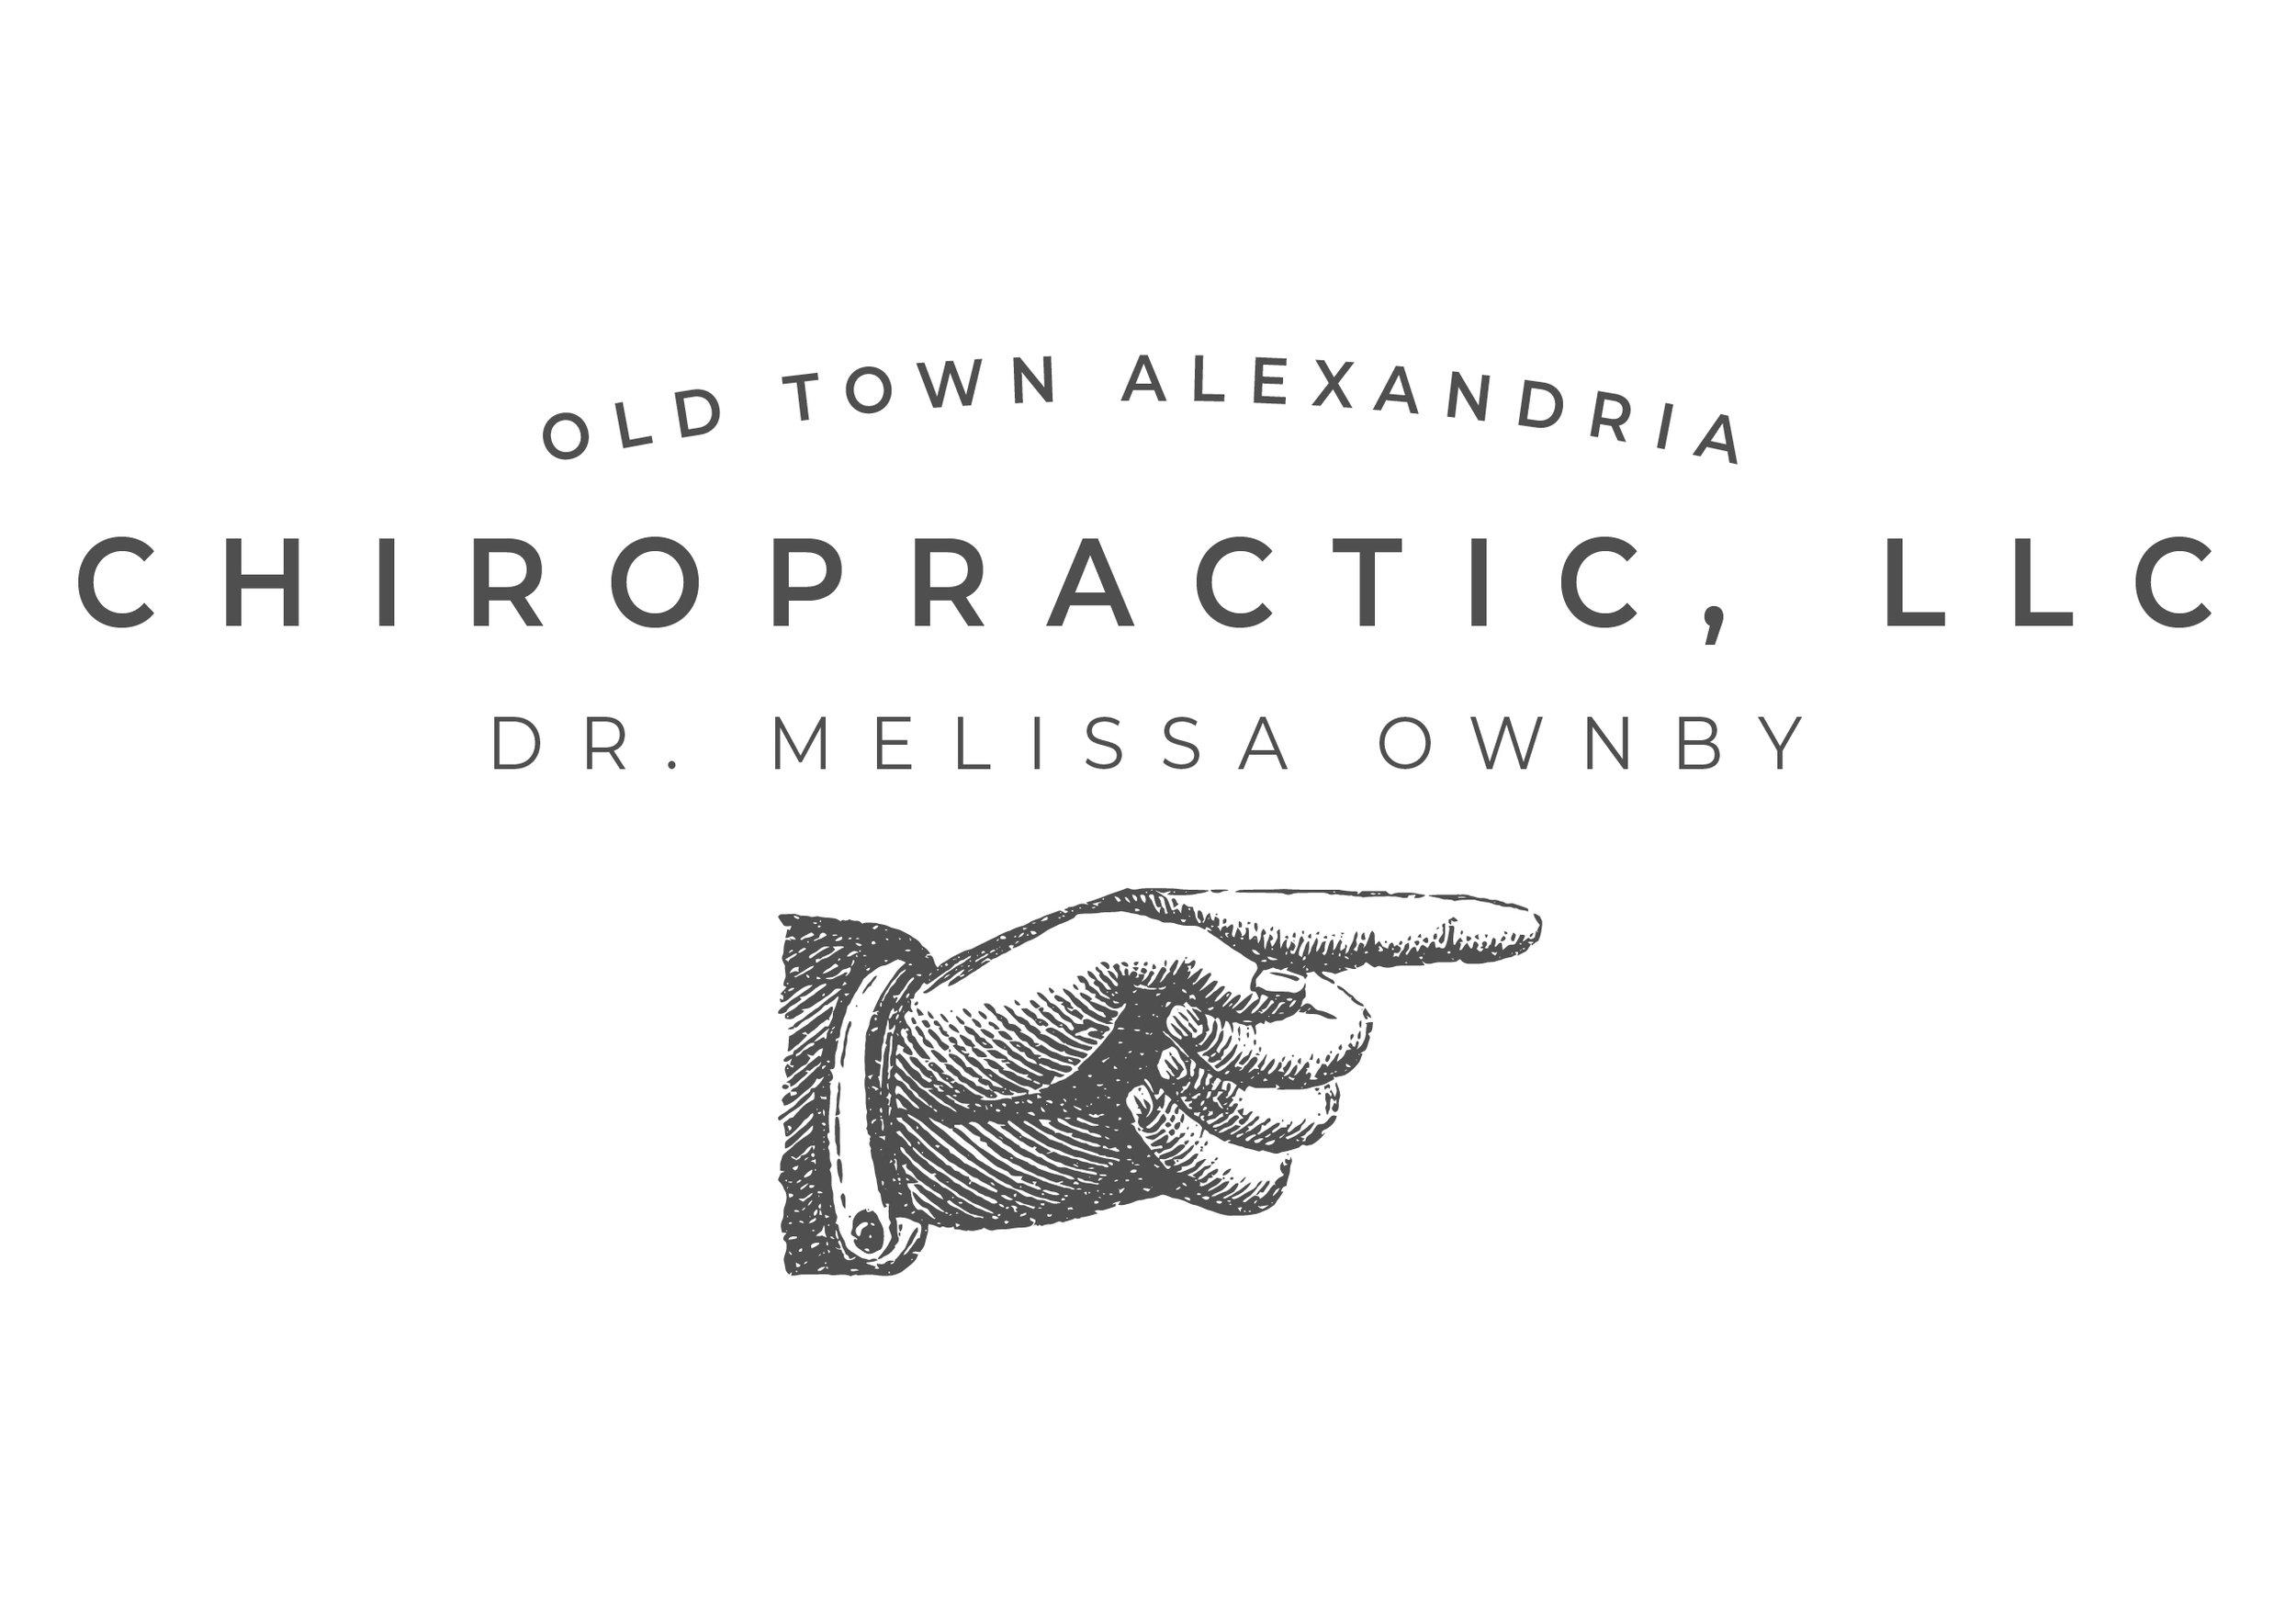 Old Town Alexandria Chiropractic